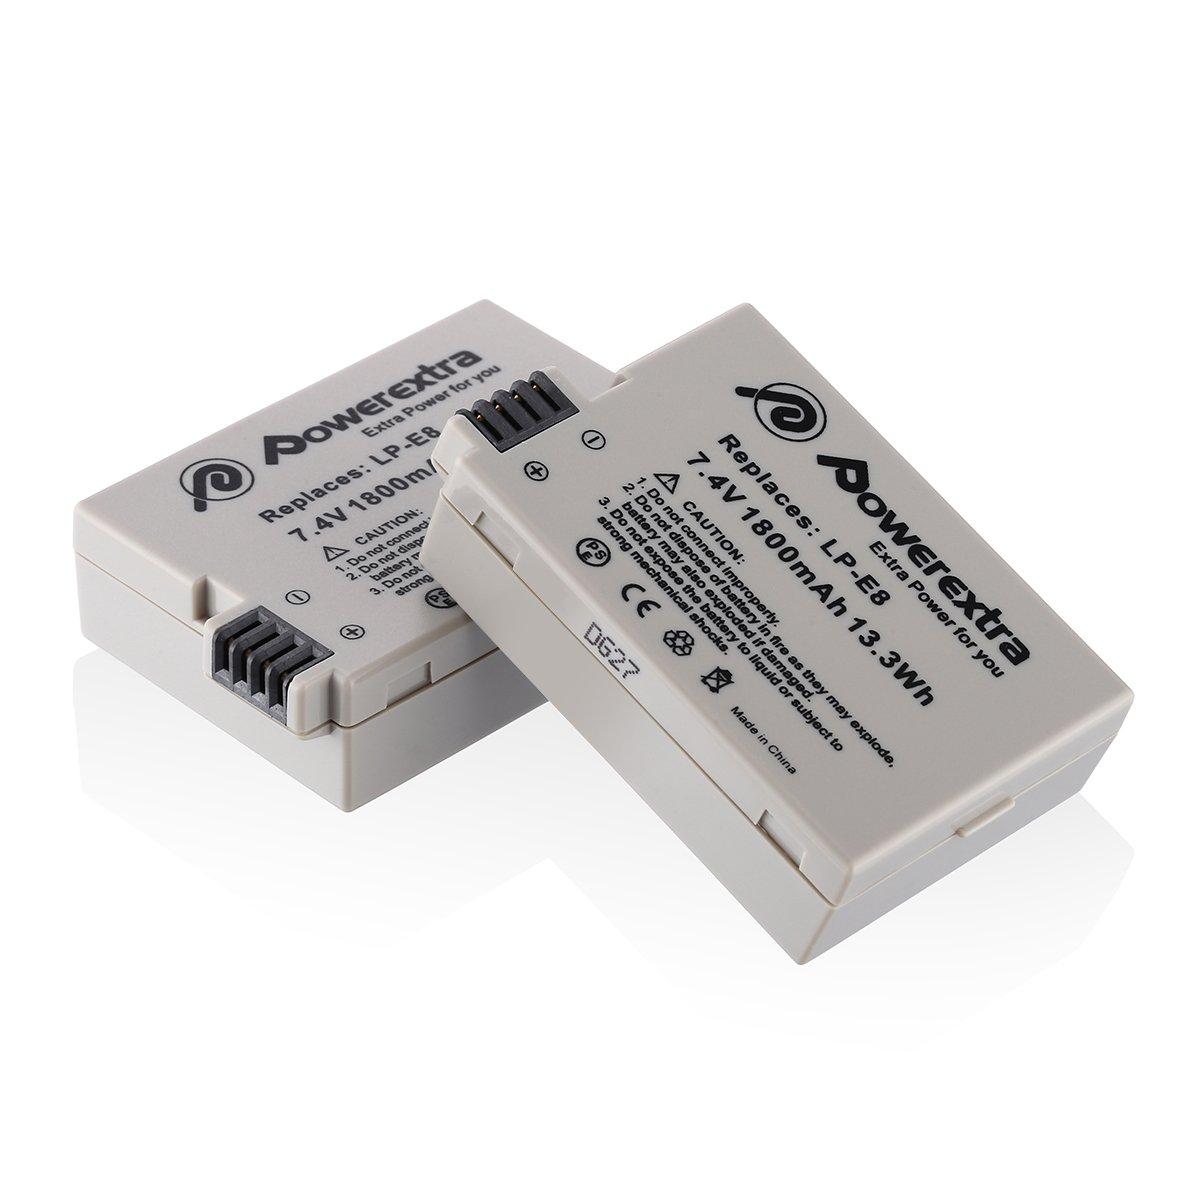 Powerextra 1800mAh Li ion Replacement Battery